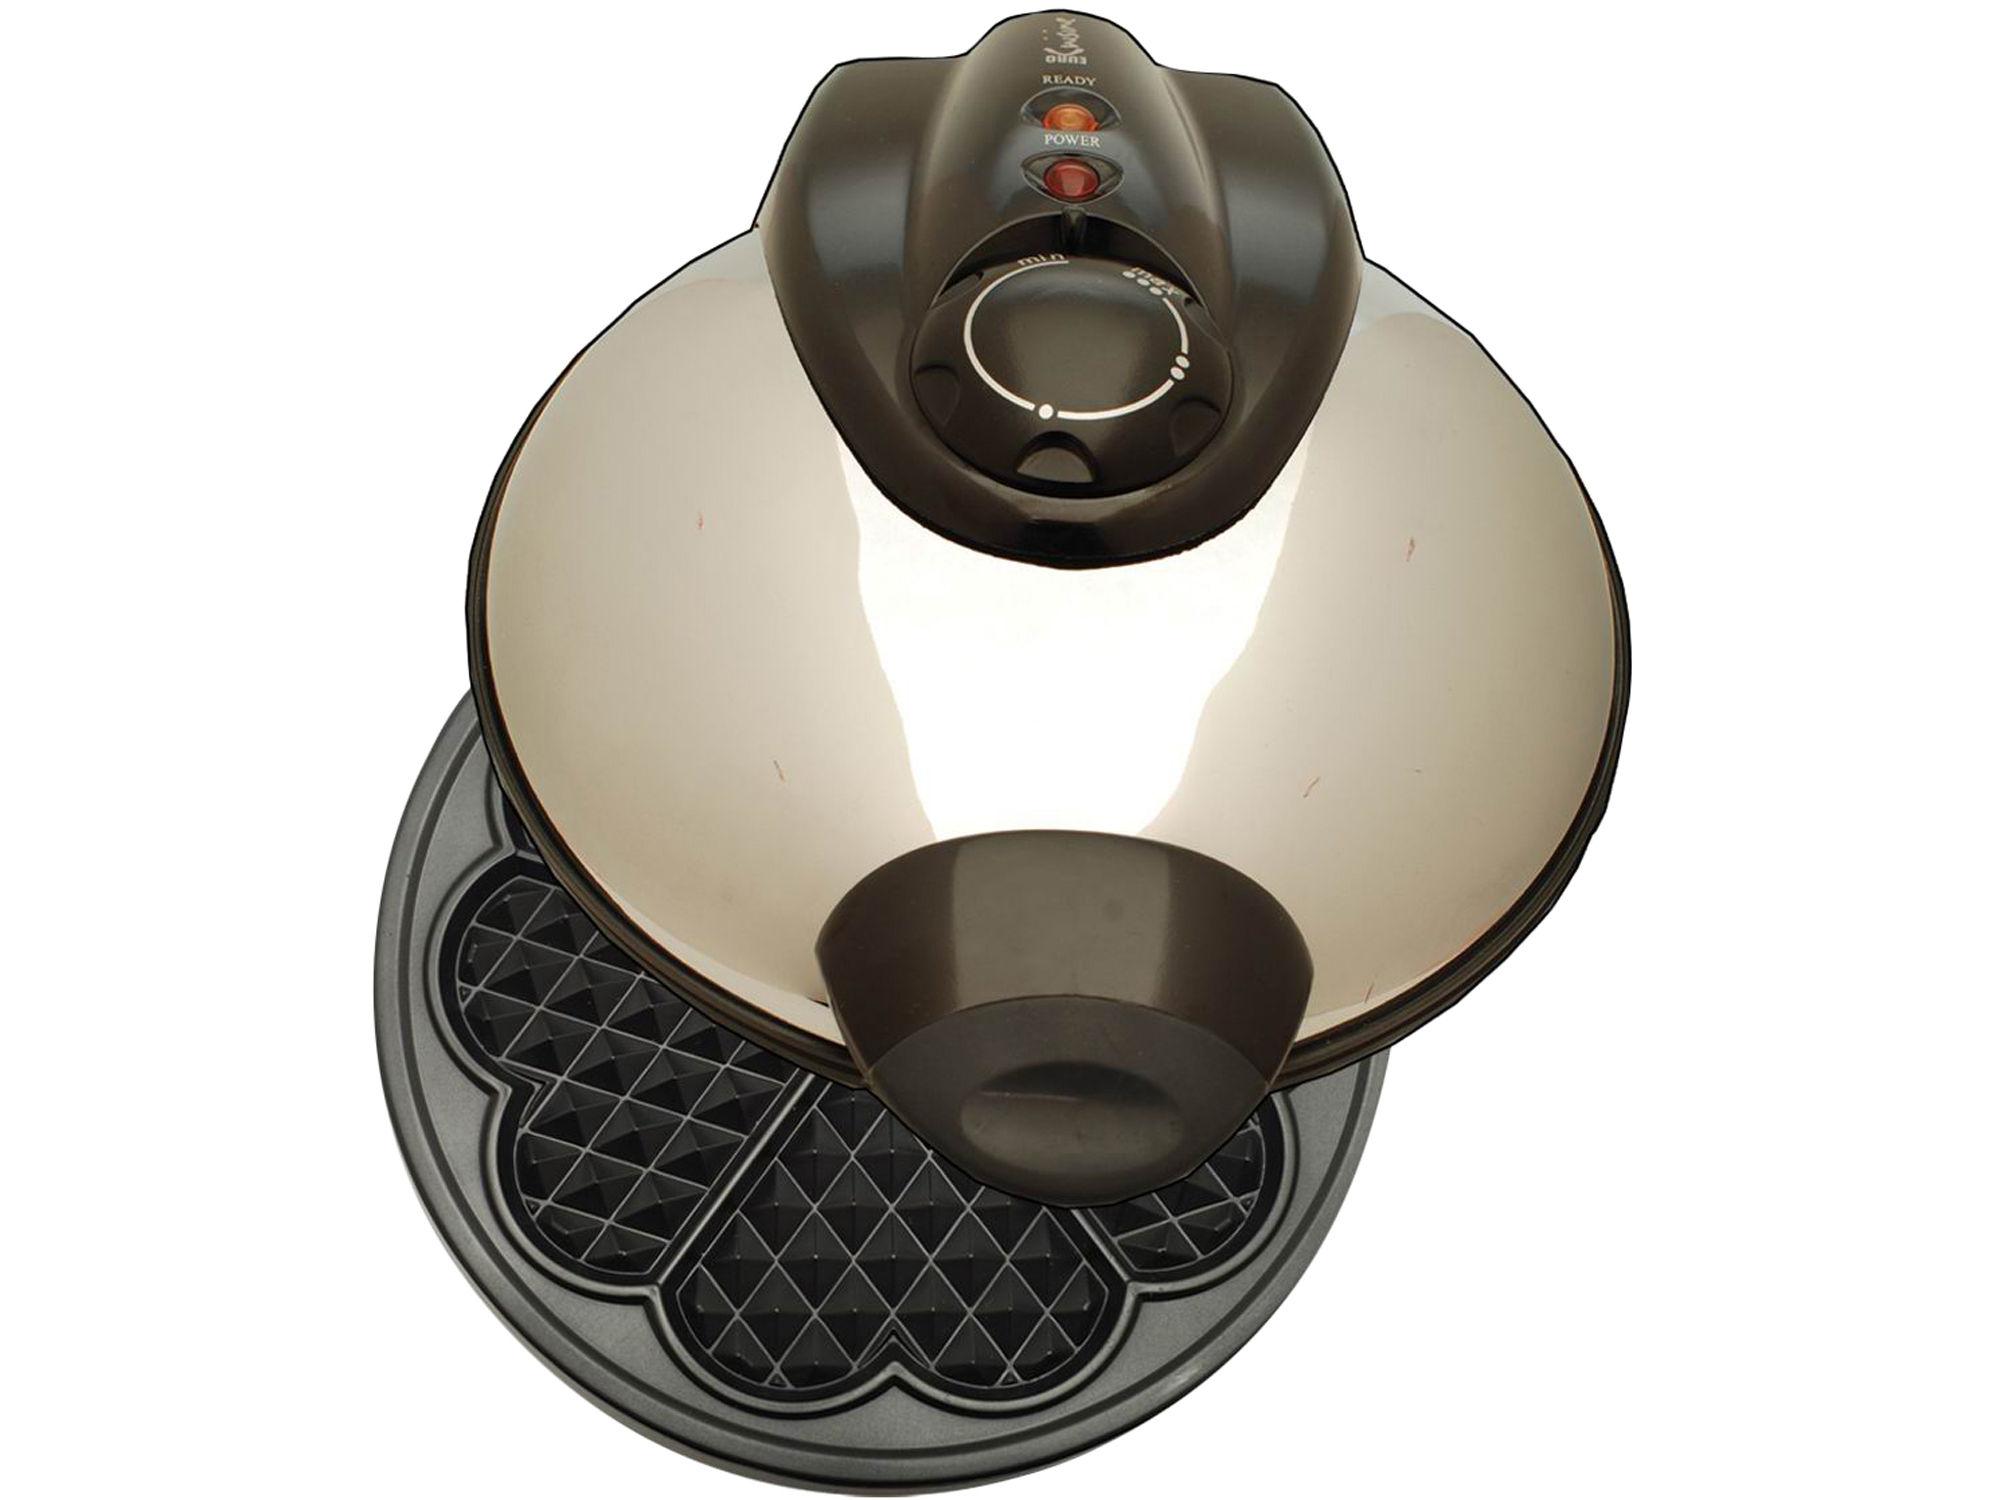 Euro-Cuisine Heart Shaped Waffle Maker WM520